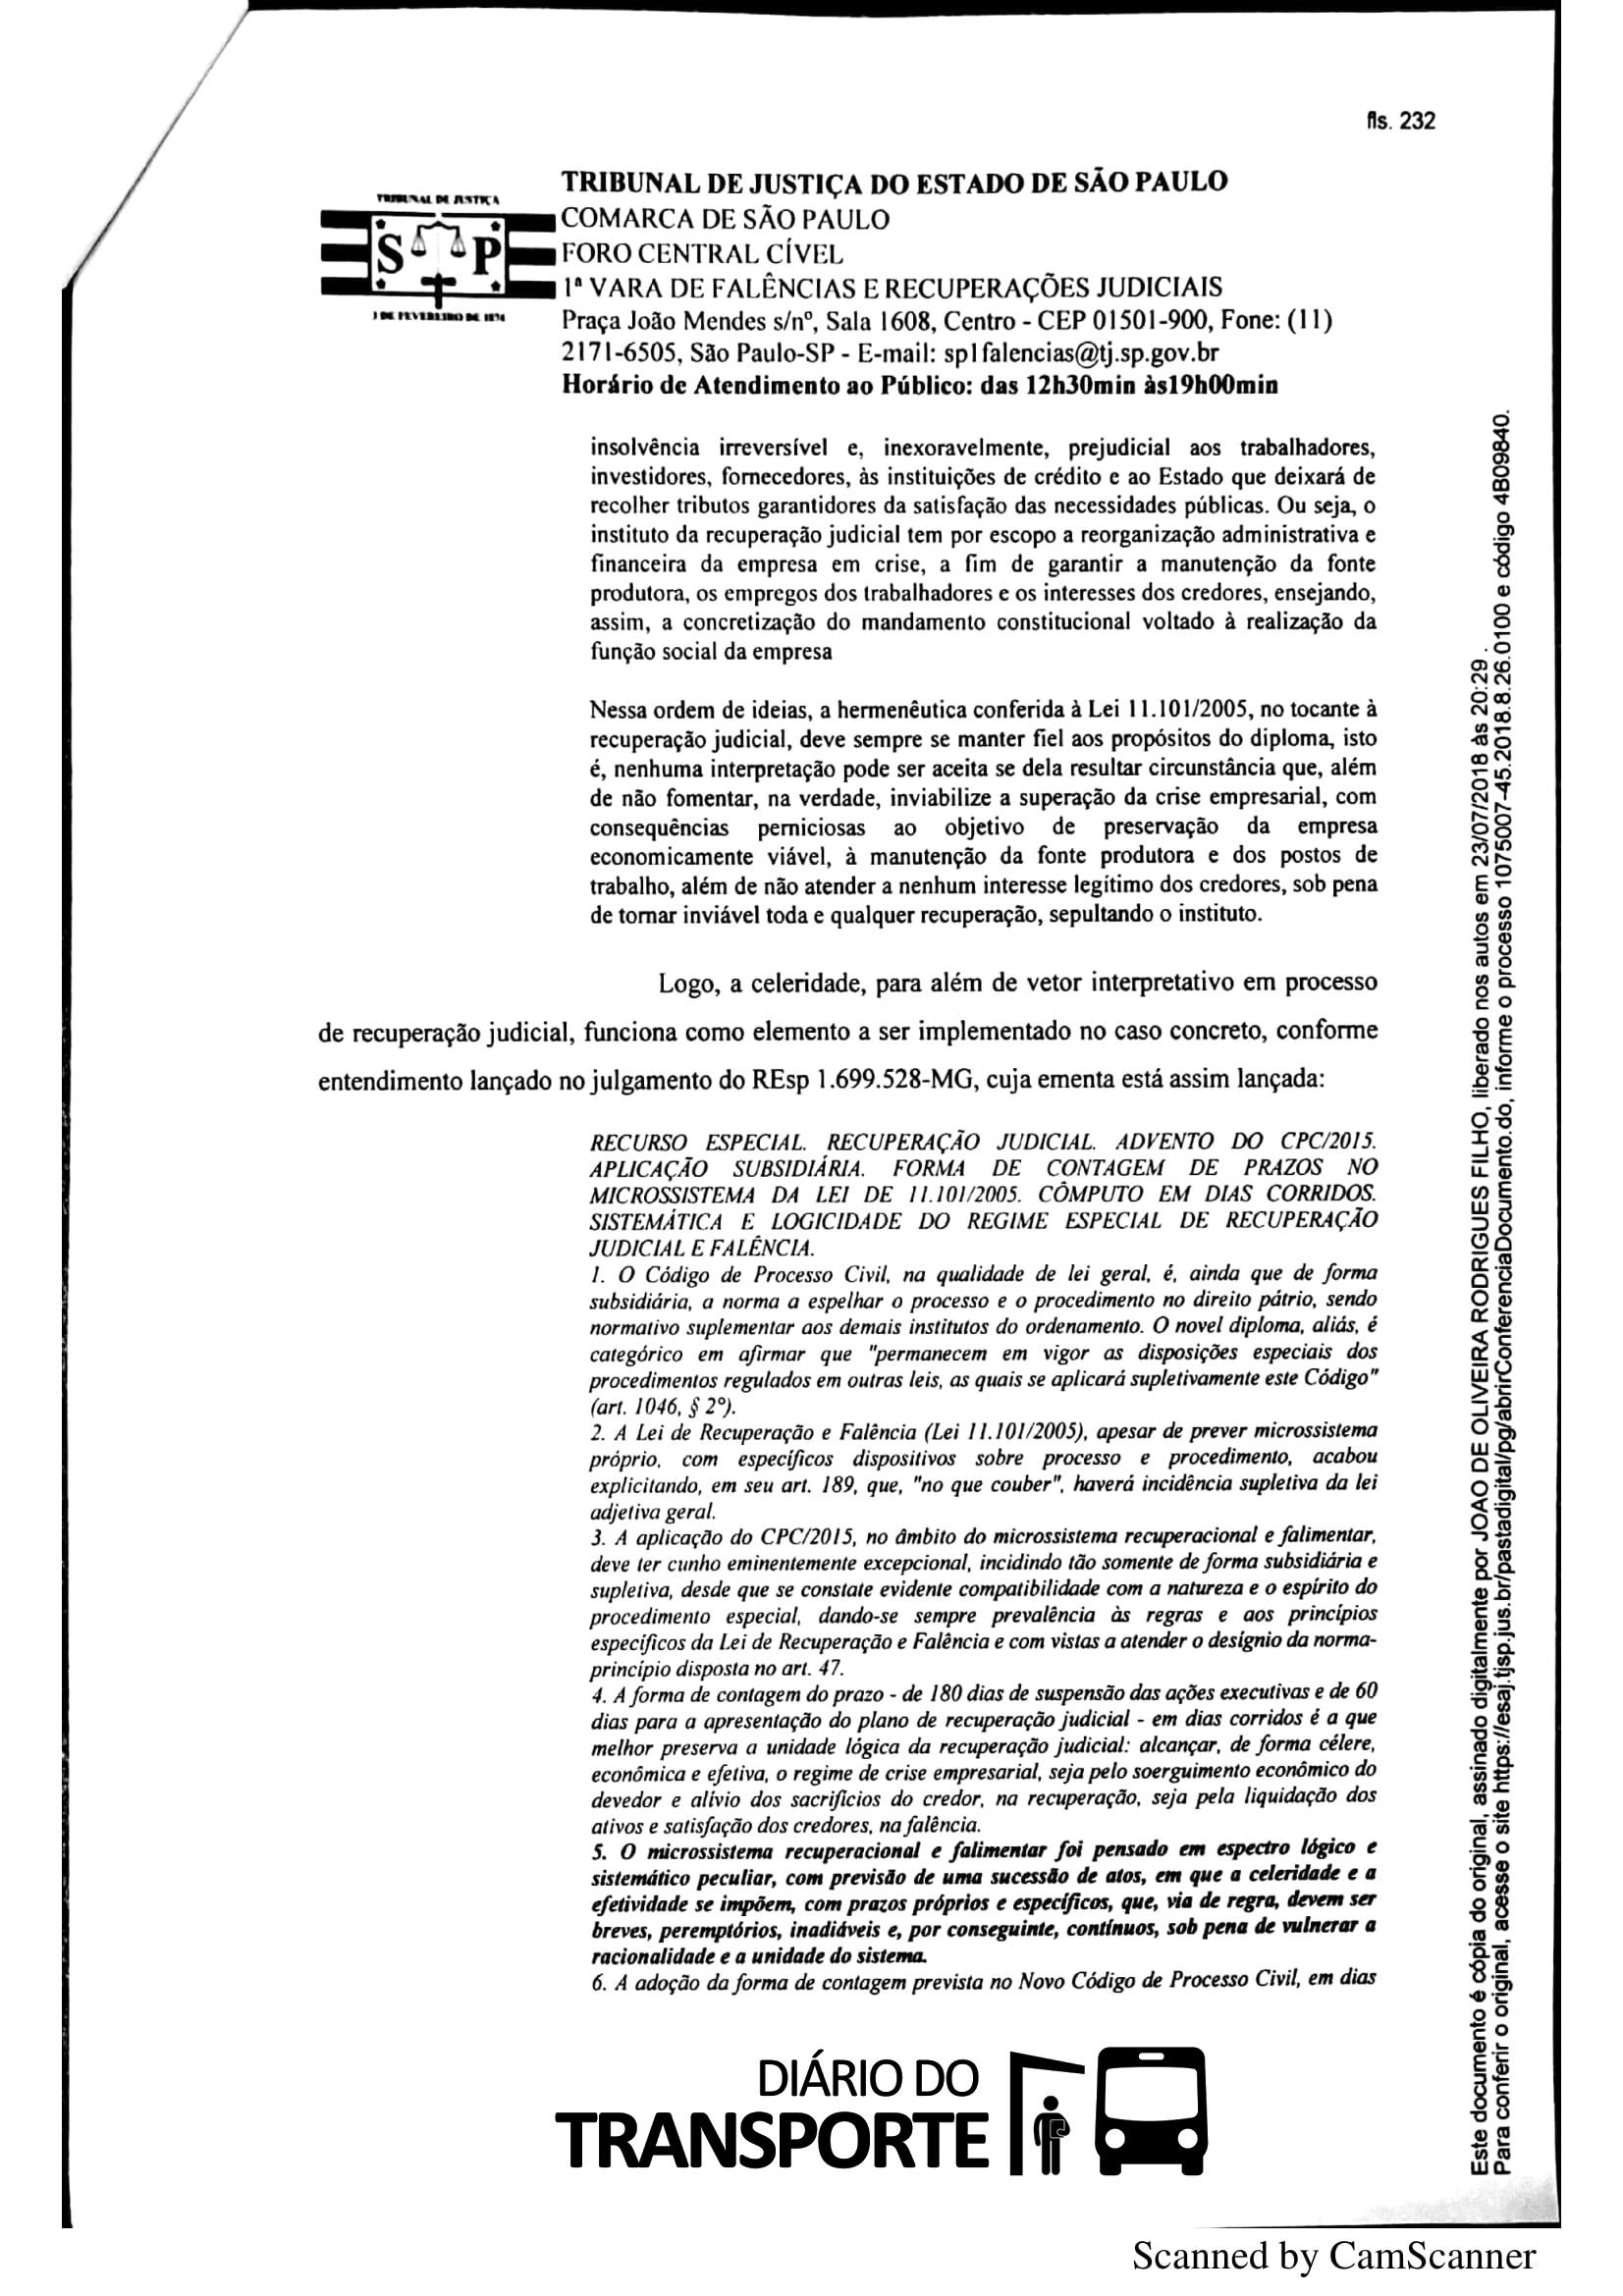 socios_afastados_itapemirim_retorno-4